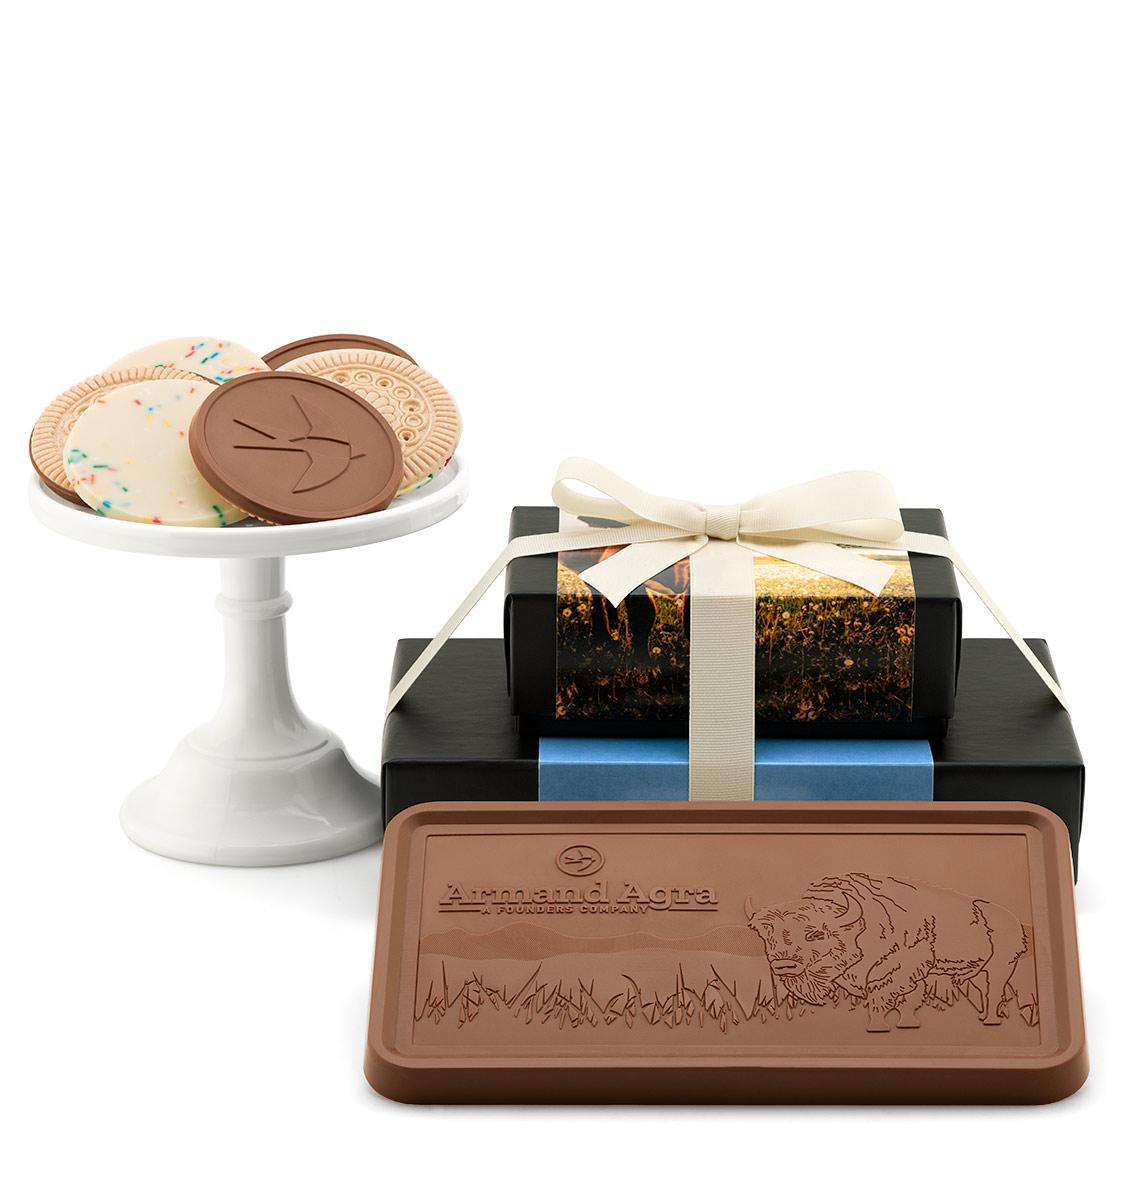 fully-custom-chocolate-8202-grand-2-piece-gift-tower-band-cookies-bar-armand-agra